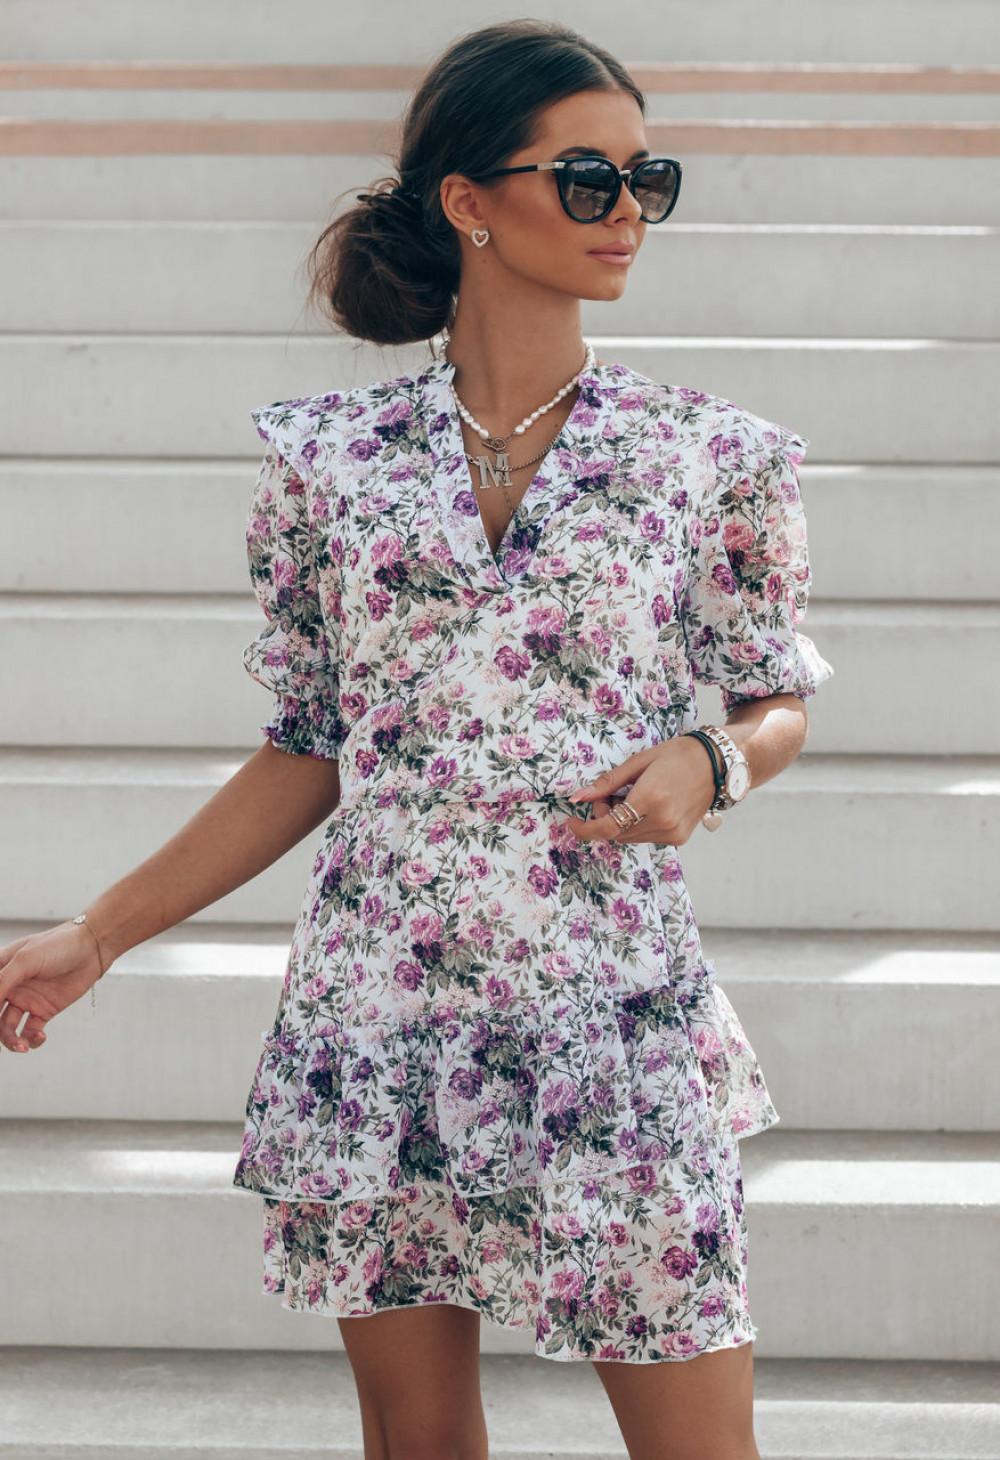 Fioletowa kwiatowa rozkloszowana sukienka V-Neck Caterina 1